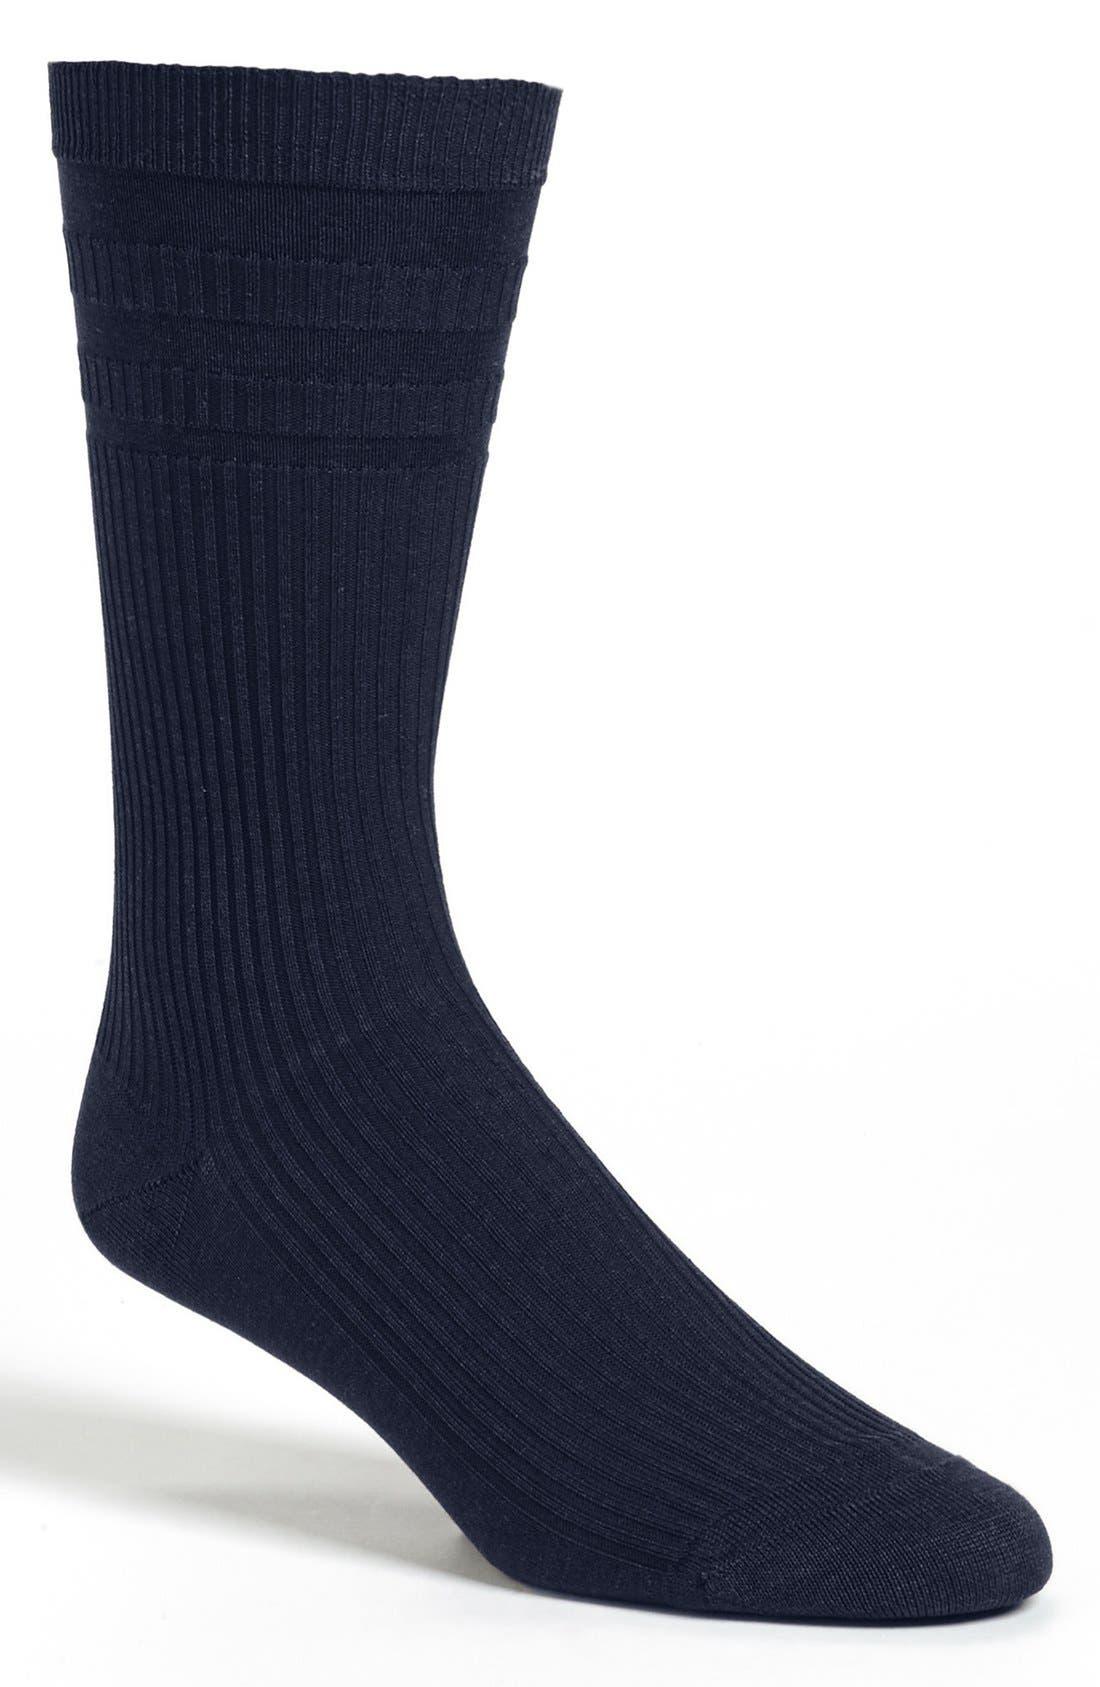 Main Image - Pantherella 'Comfort Top' Dress Socks